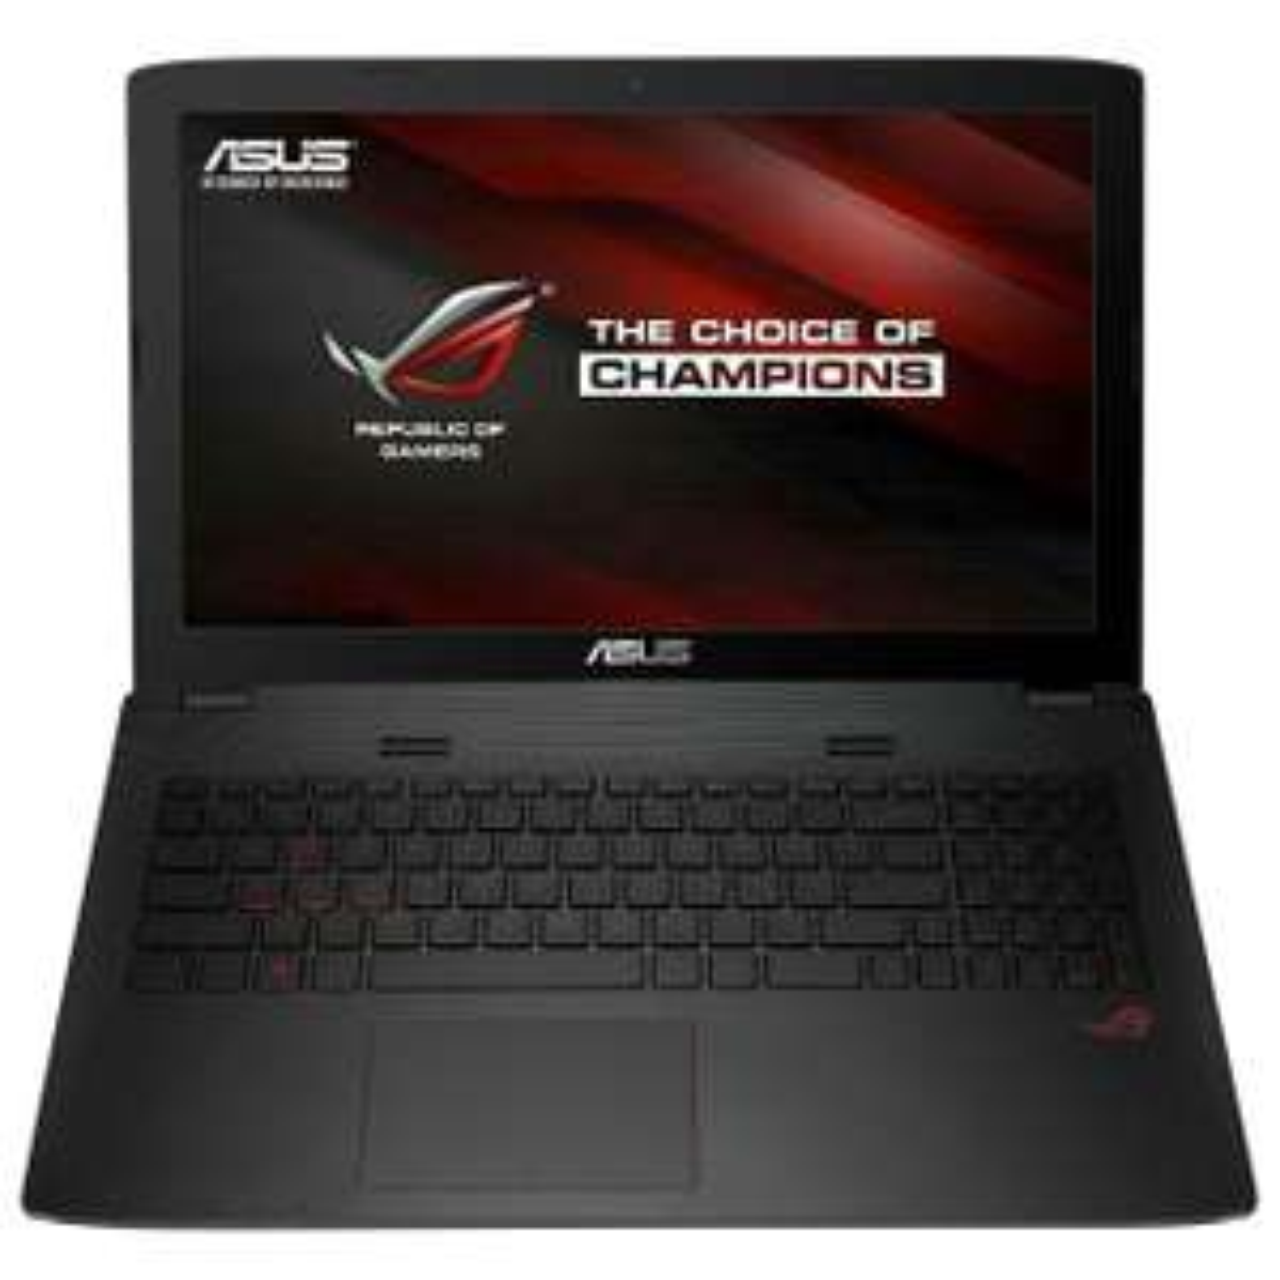 "Pc portable 15.6"" Full HD Asus G552VW-DM814T (i5-6300HQ, 8 Go Ram,  256 Go  SSD, GTX 960M, Windows 10)"